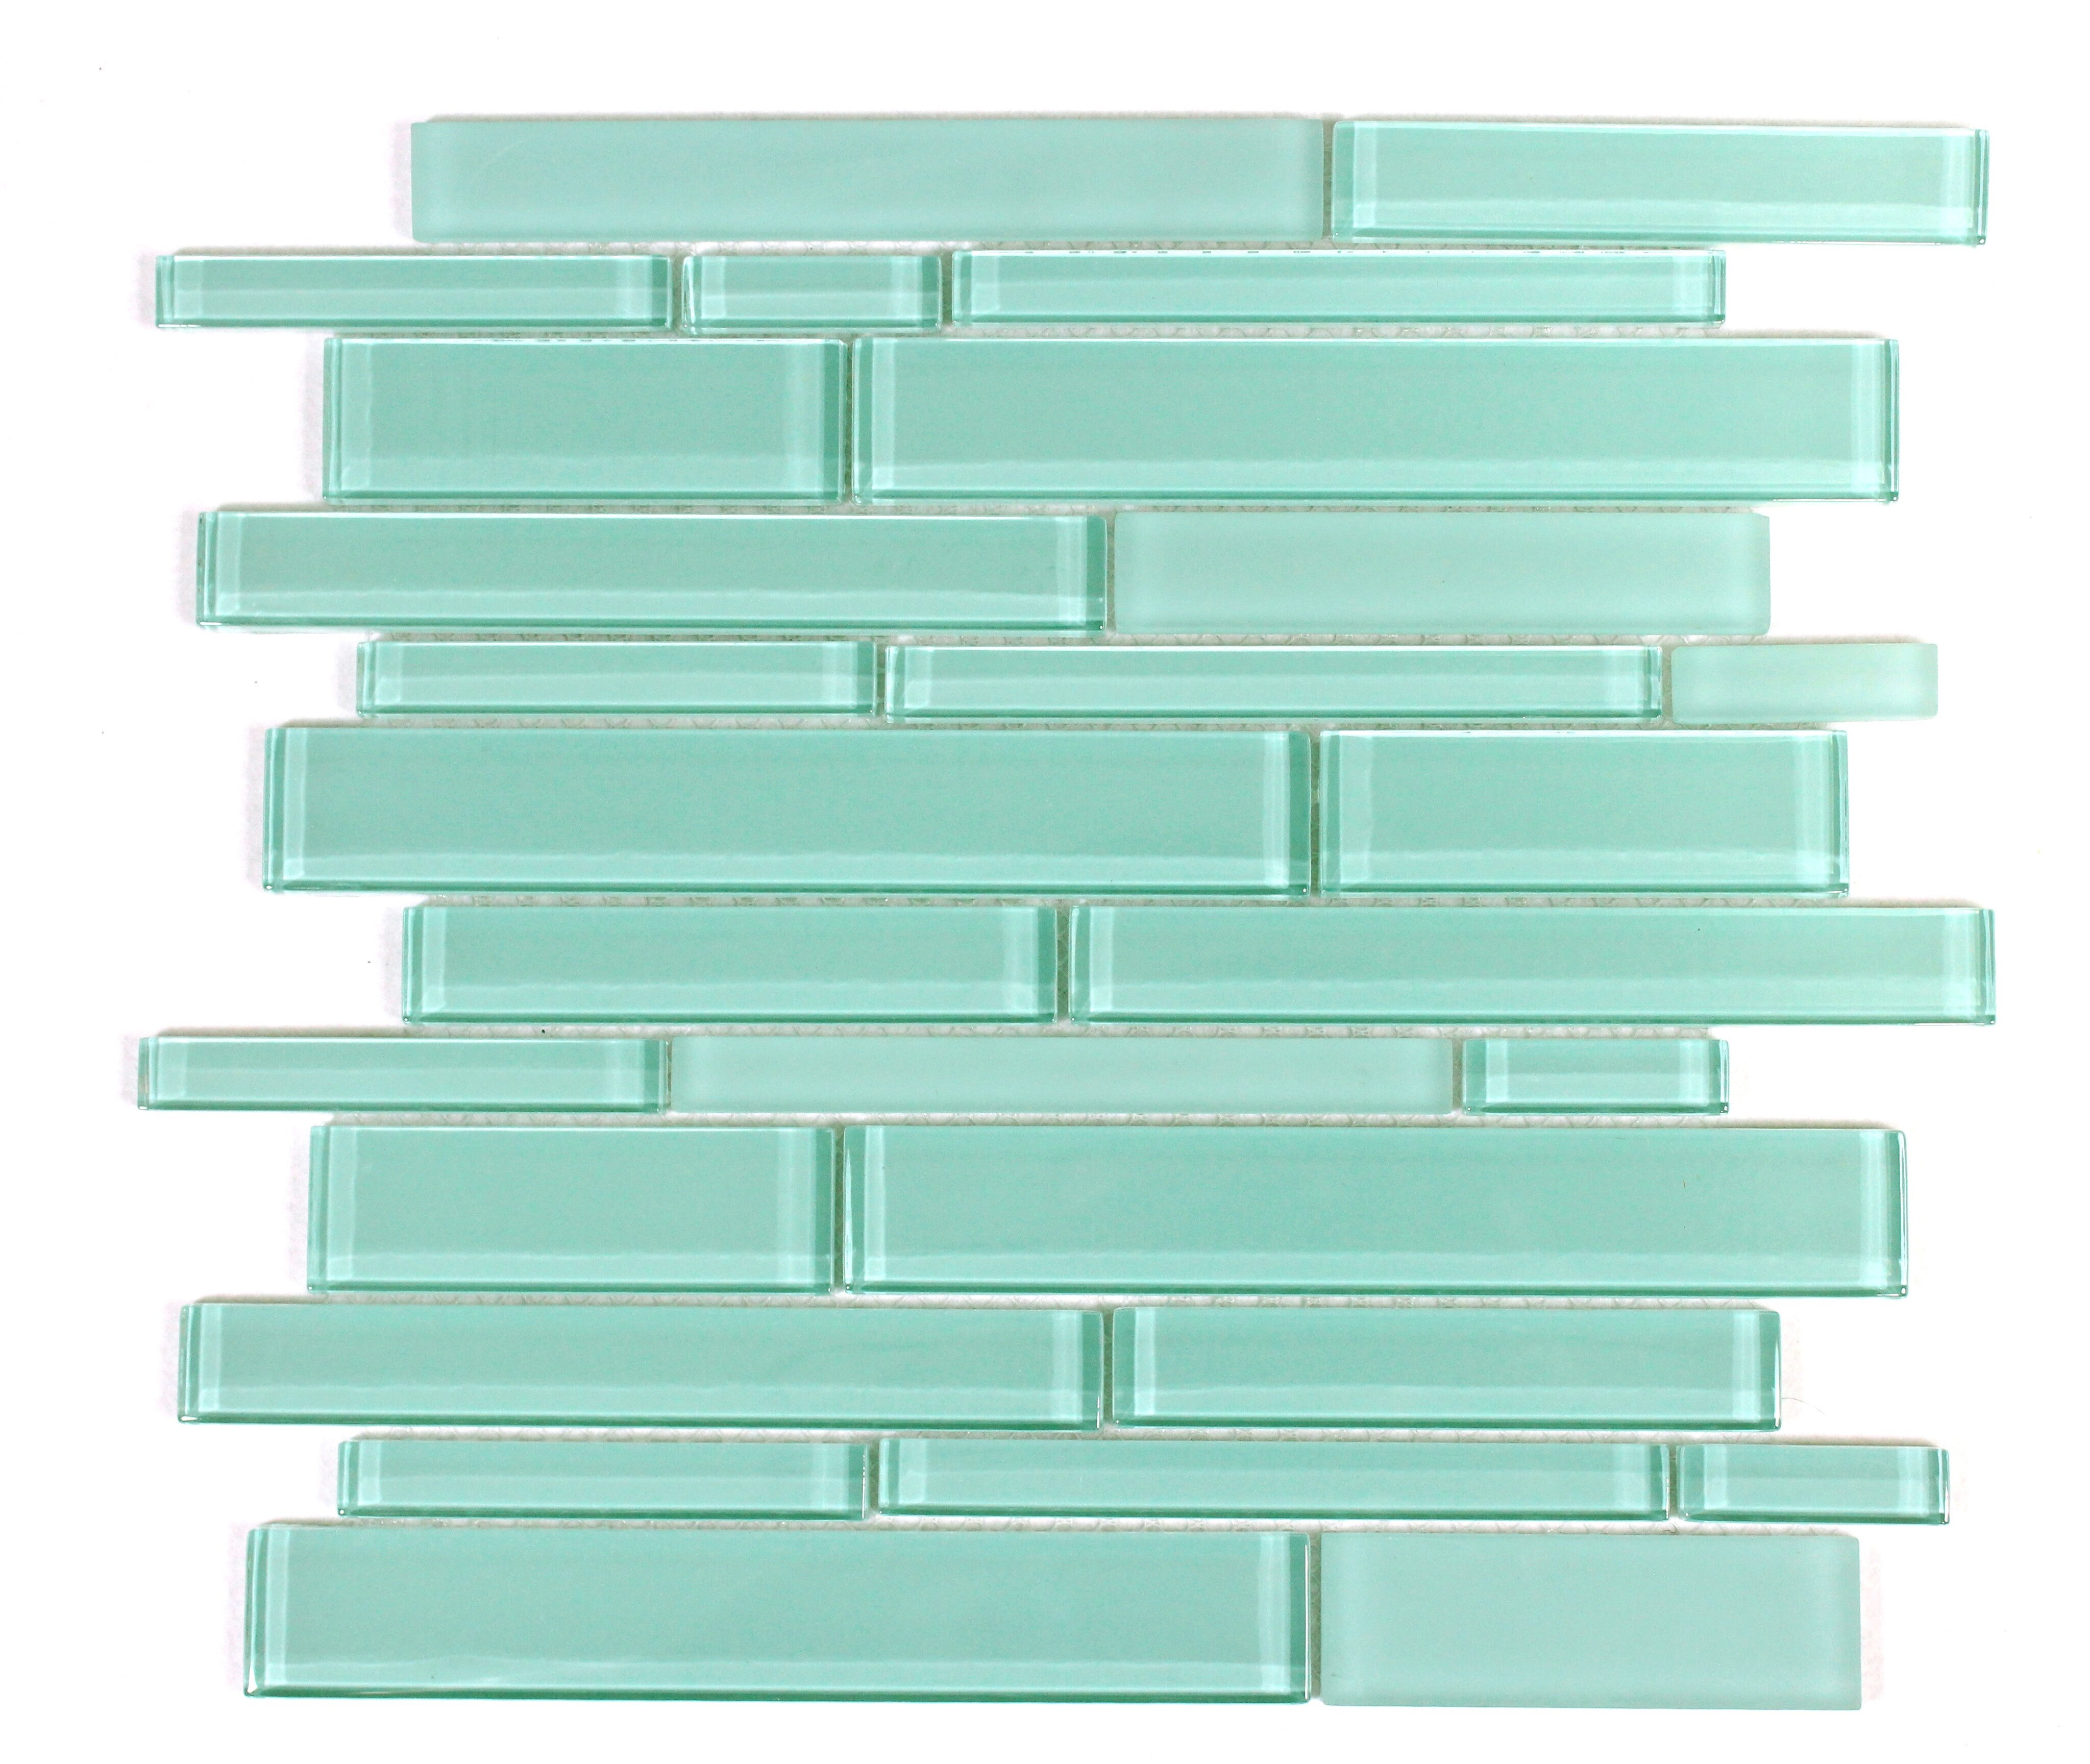 WS Tiles Premium Random Sized Glass Mosaic Tile in Teal & Reviews ...